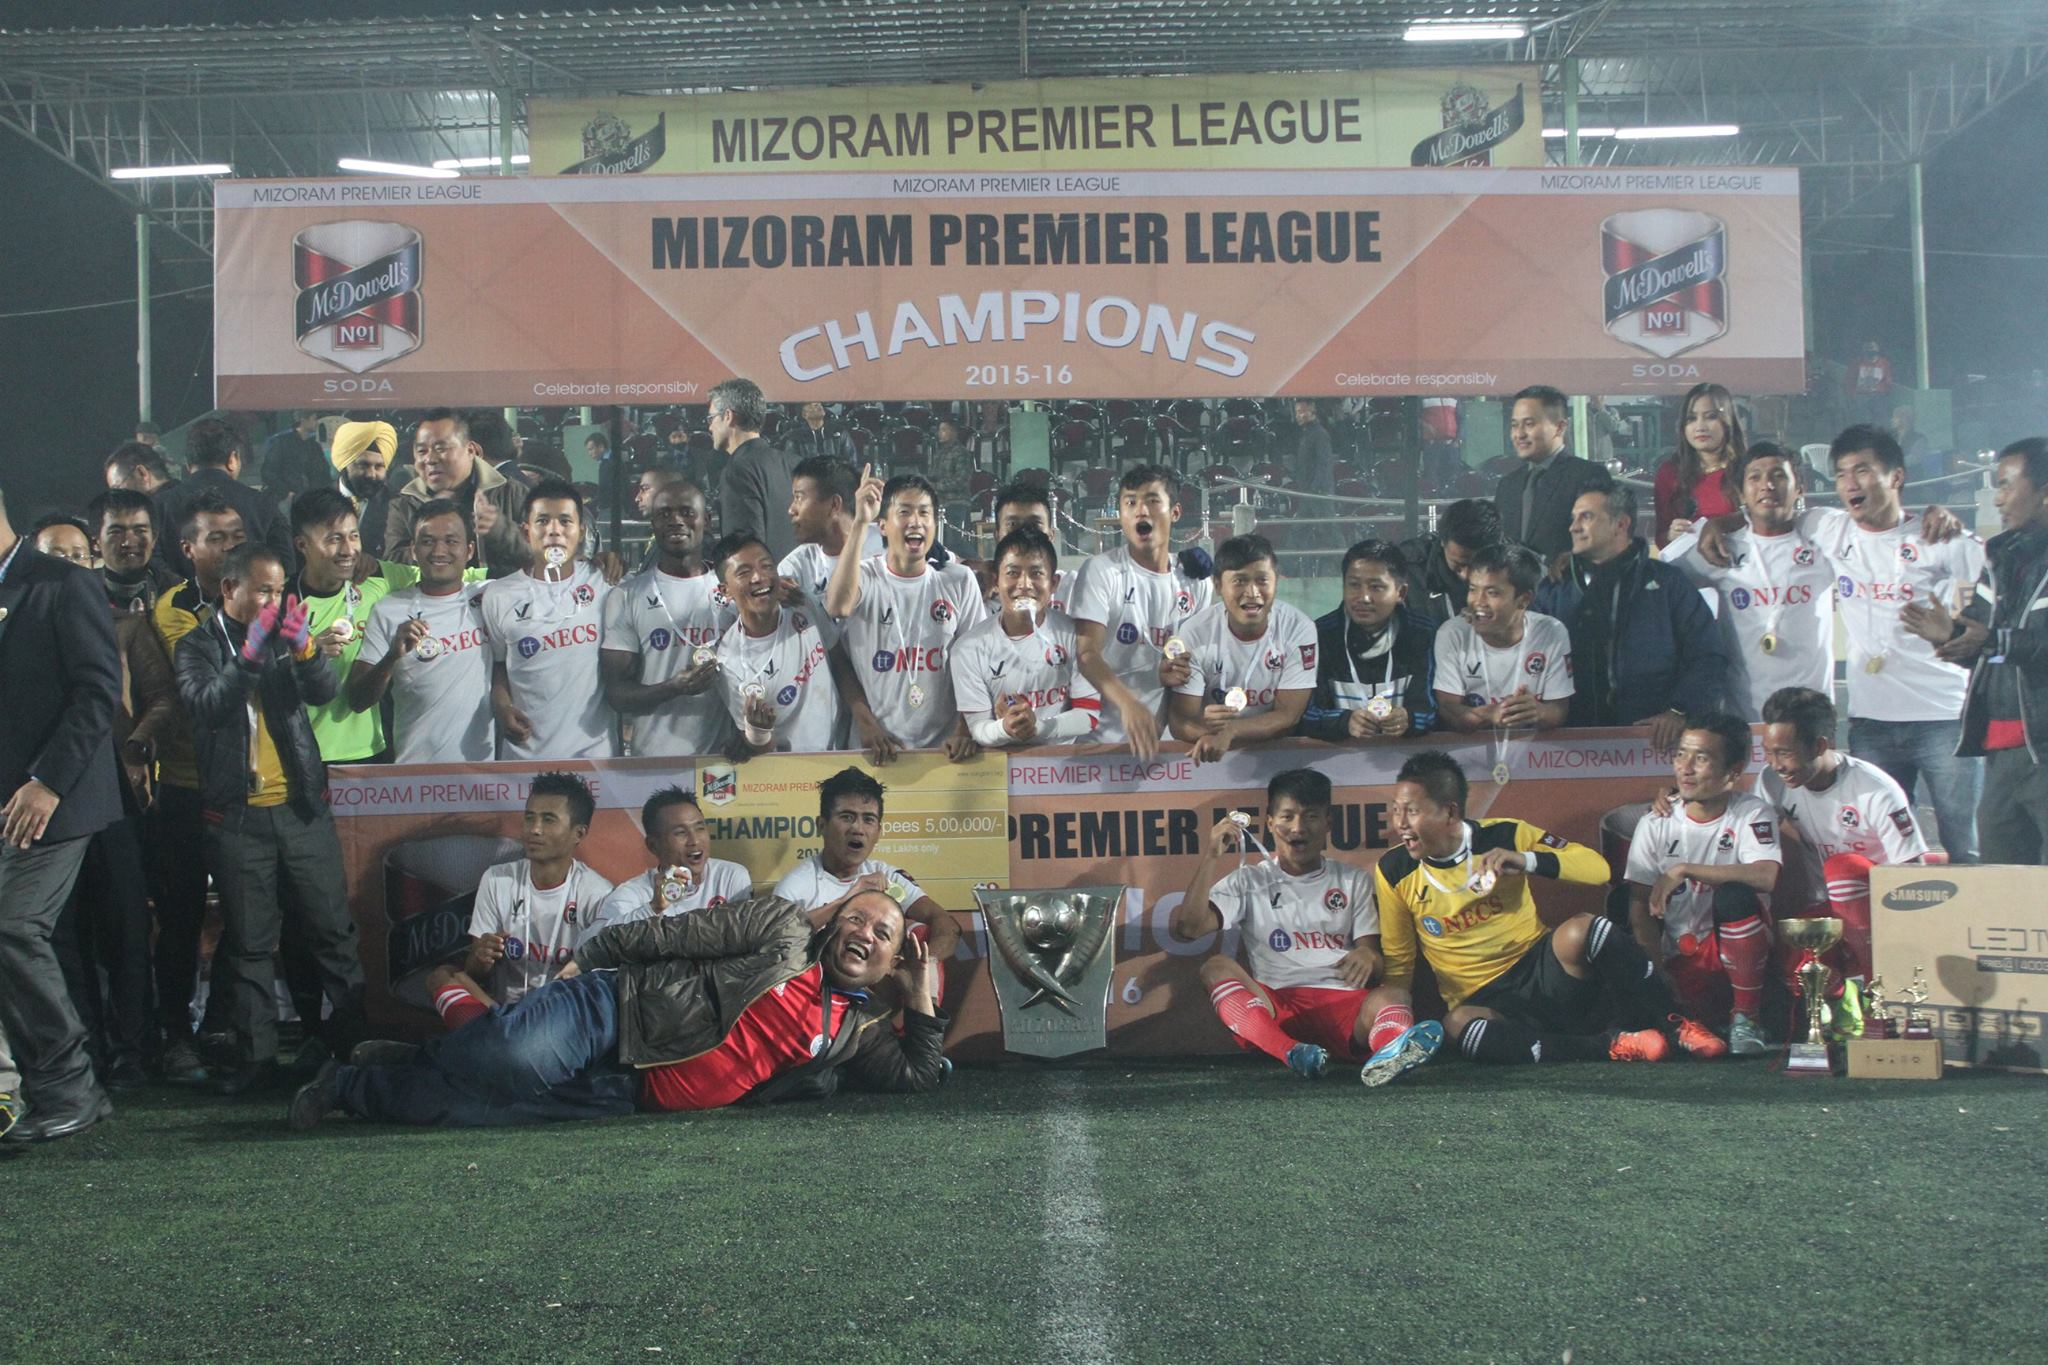 Aizawl FC Mizoram Premier League 2015